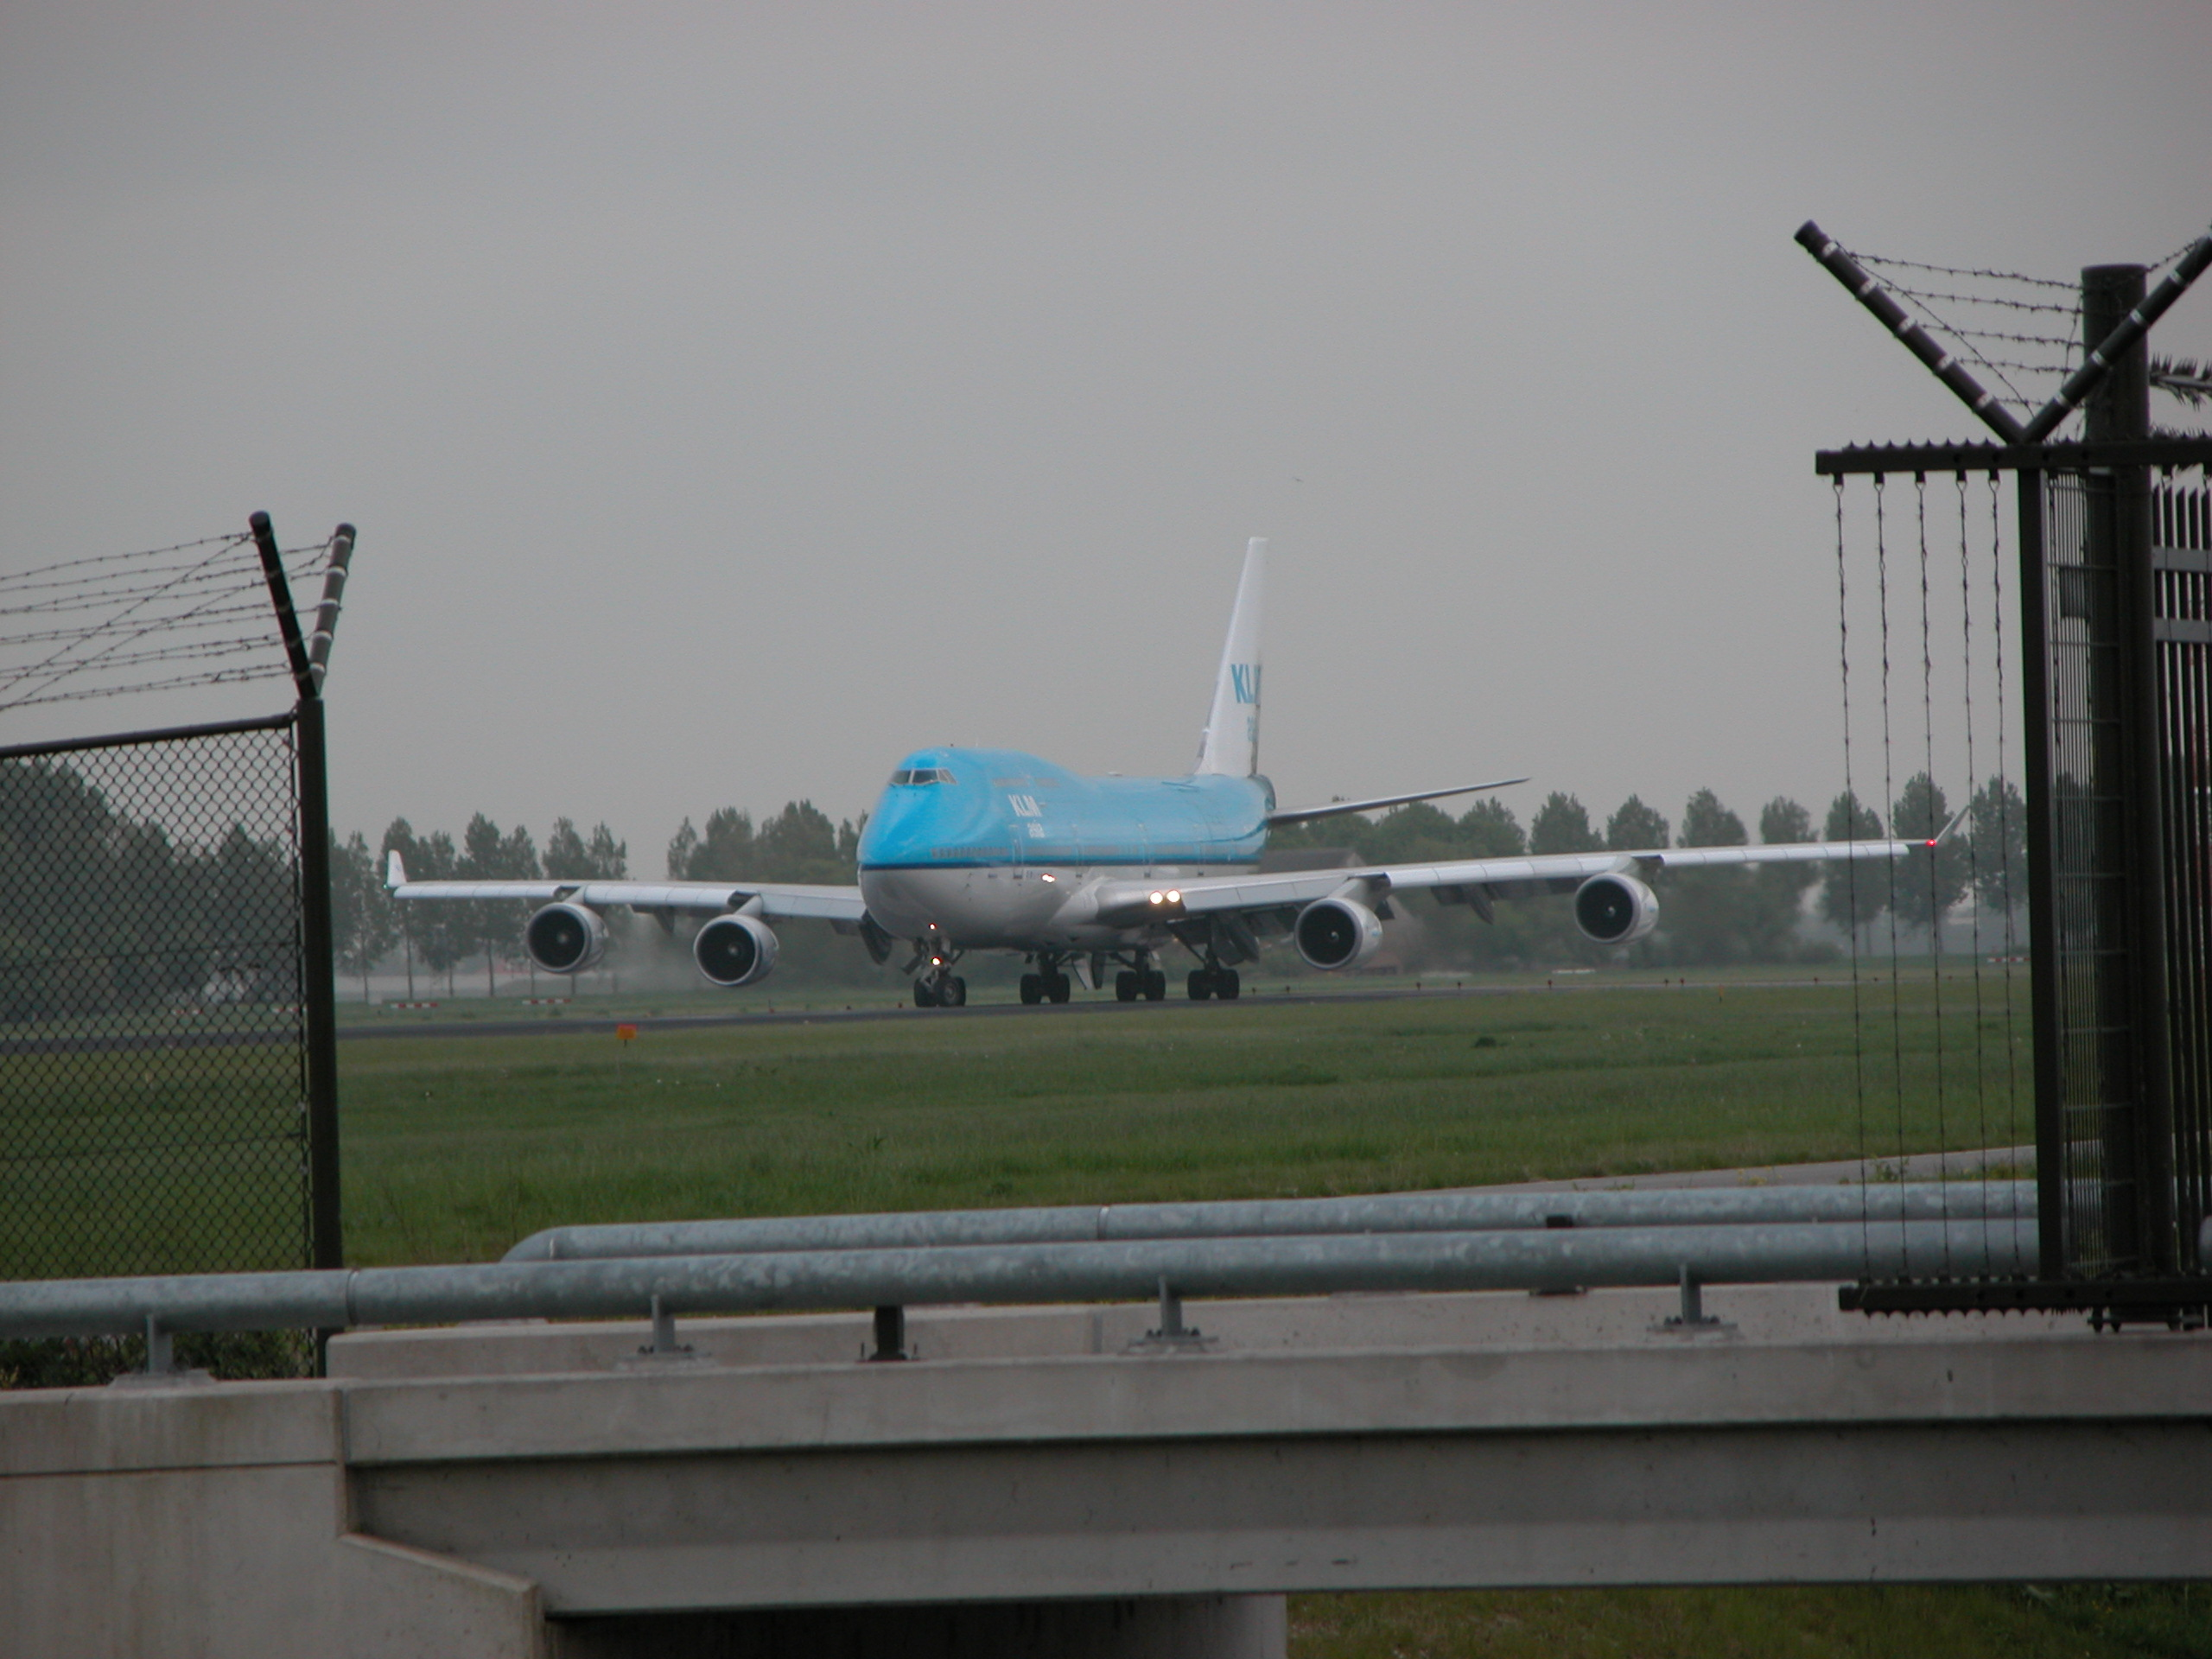 vehicles air boeing 747 taxiing airport schiphol klm jumbojet aeroplane images